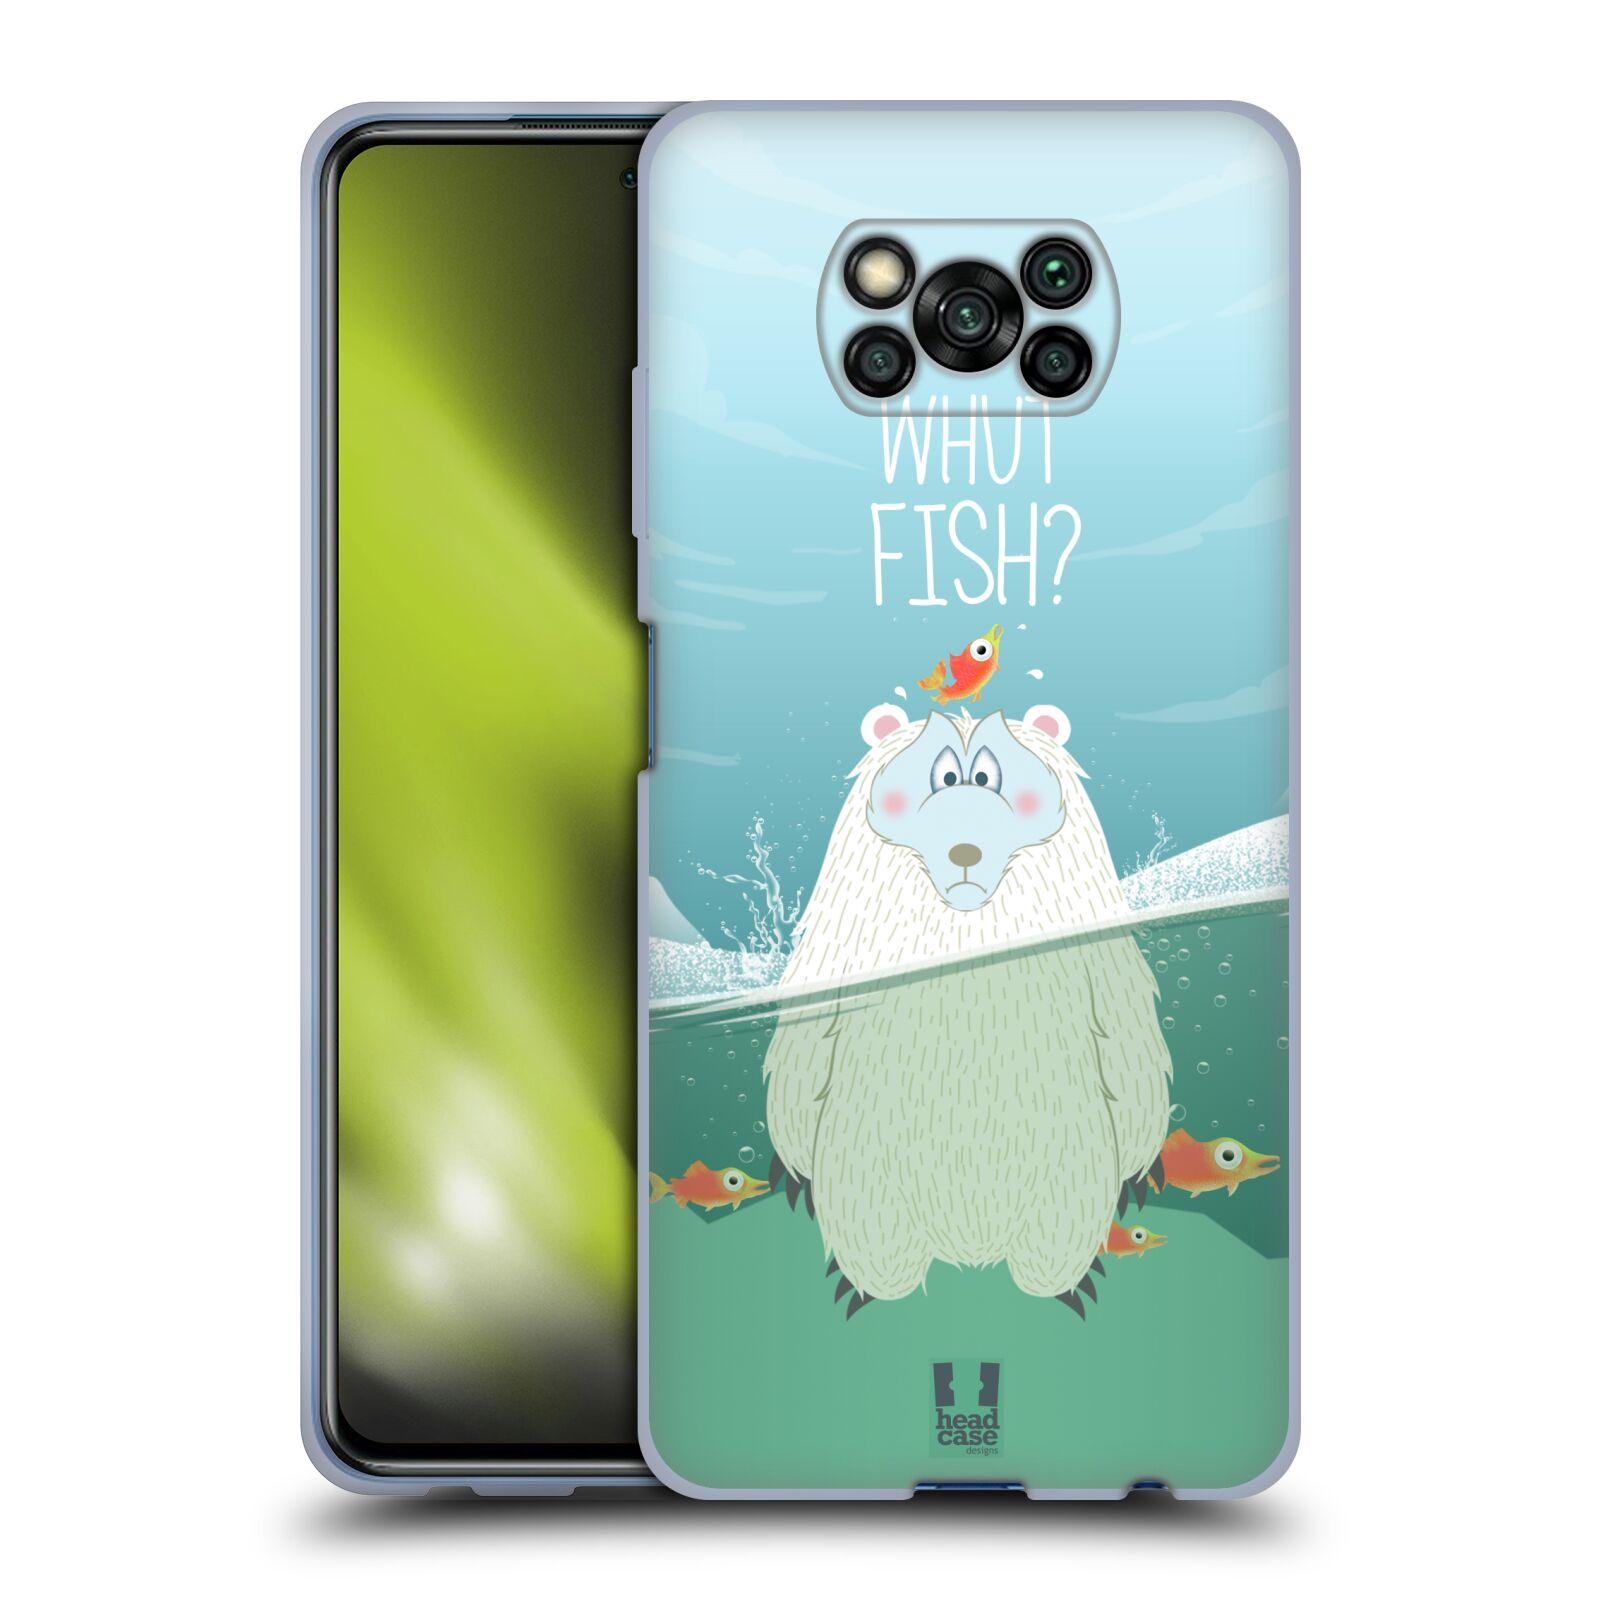 Silikonové pouzdro na mobil Xiaomi Poco X3 NFC - Head Case - Medvěd Whut Fish?